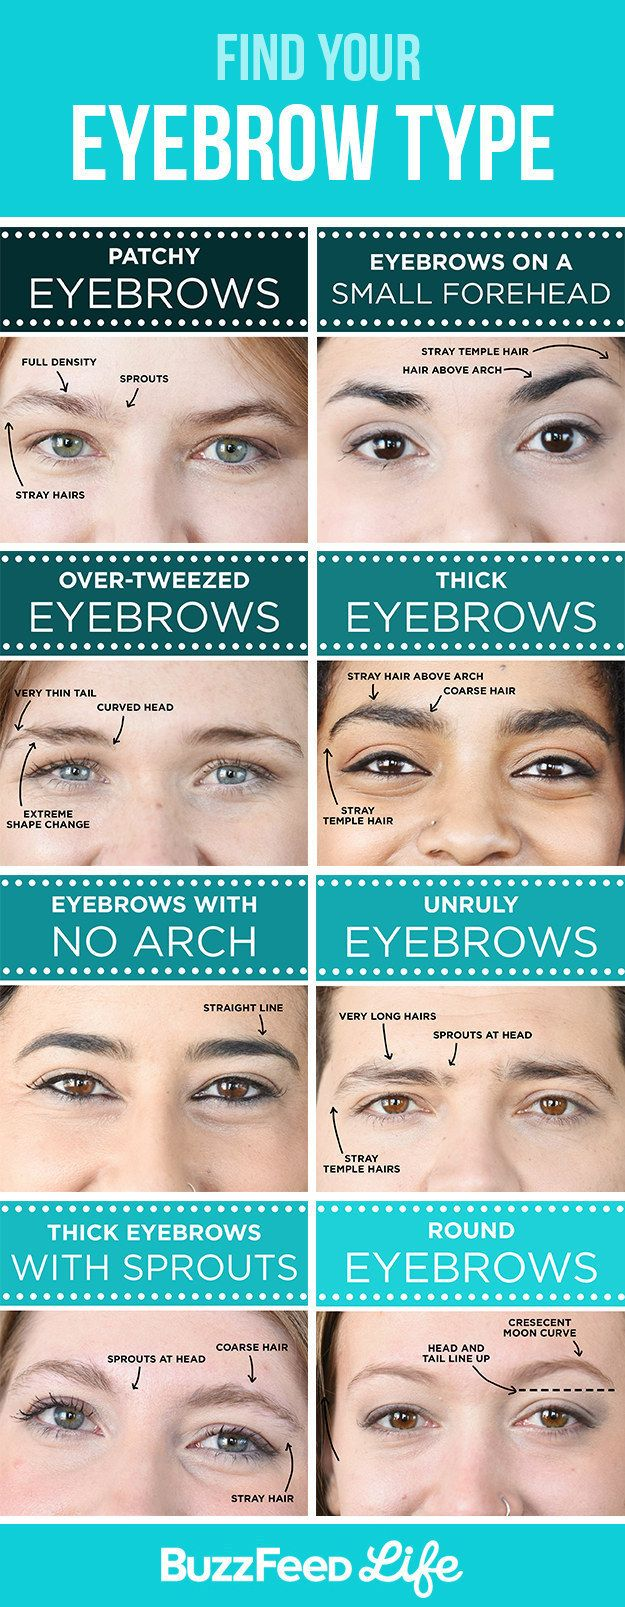 23 Cosmetic tattoo ideas  microblading eyebrows, eyebrow makeup